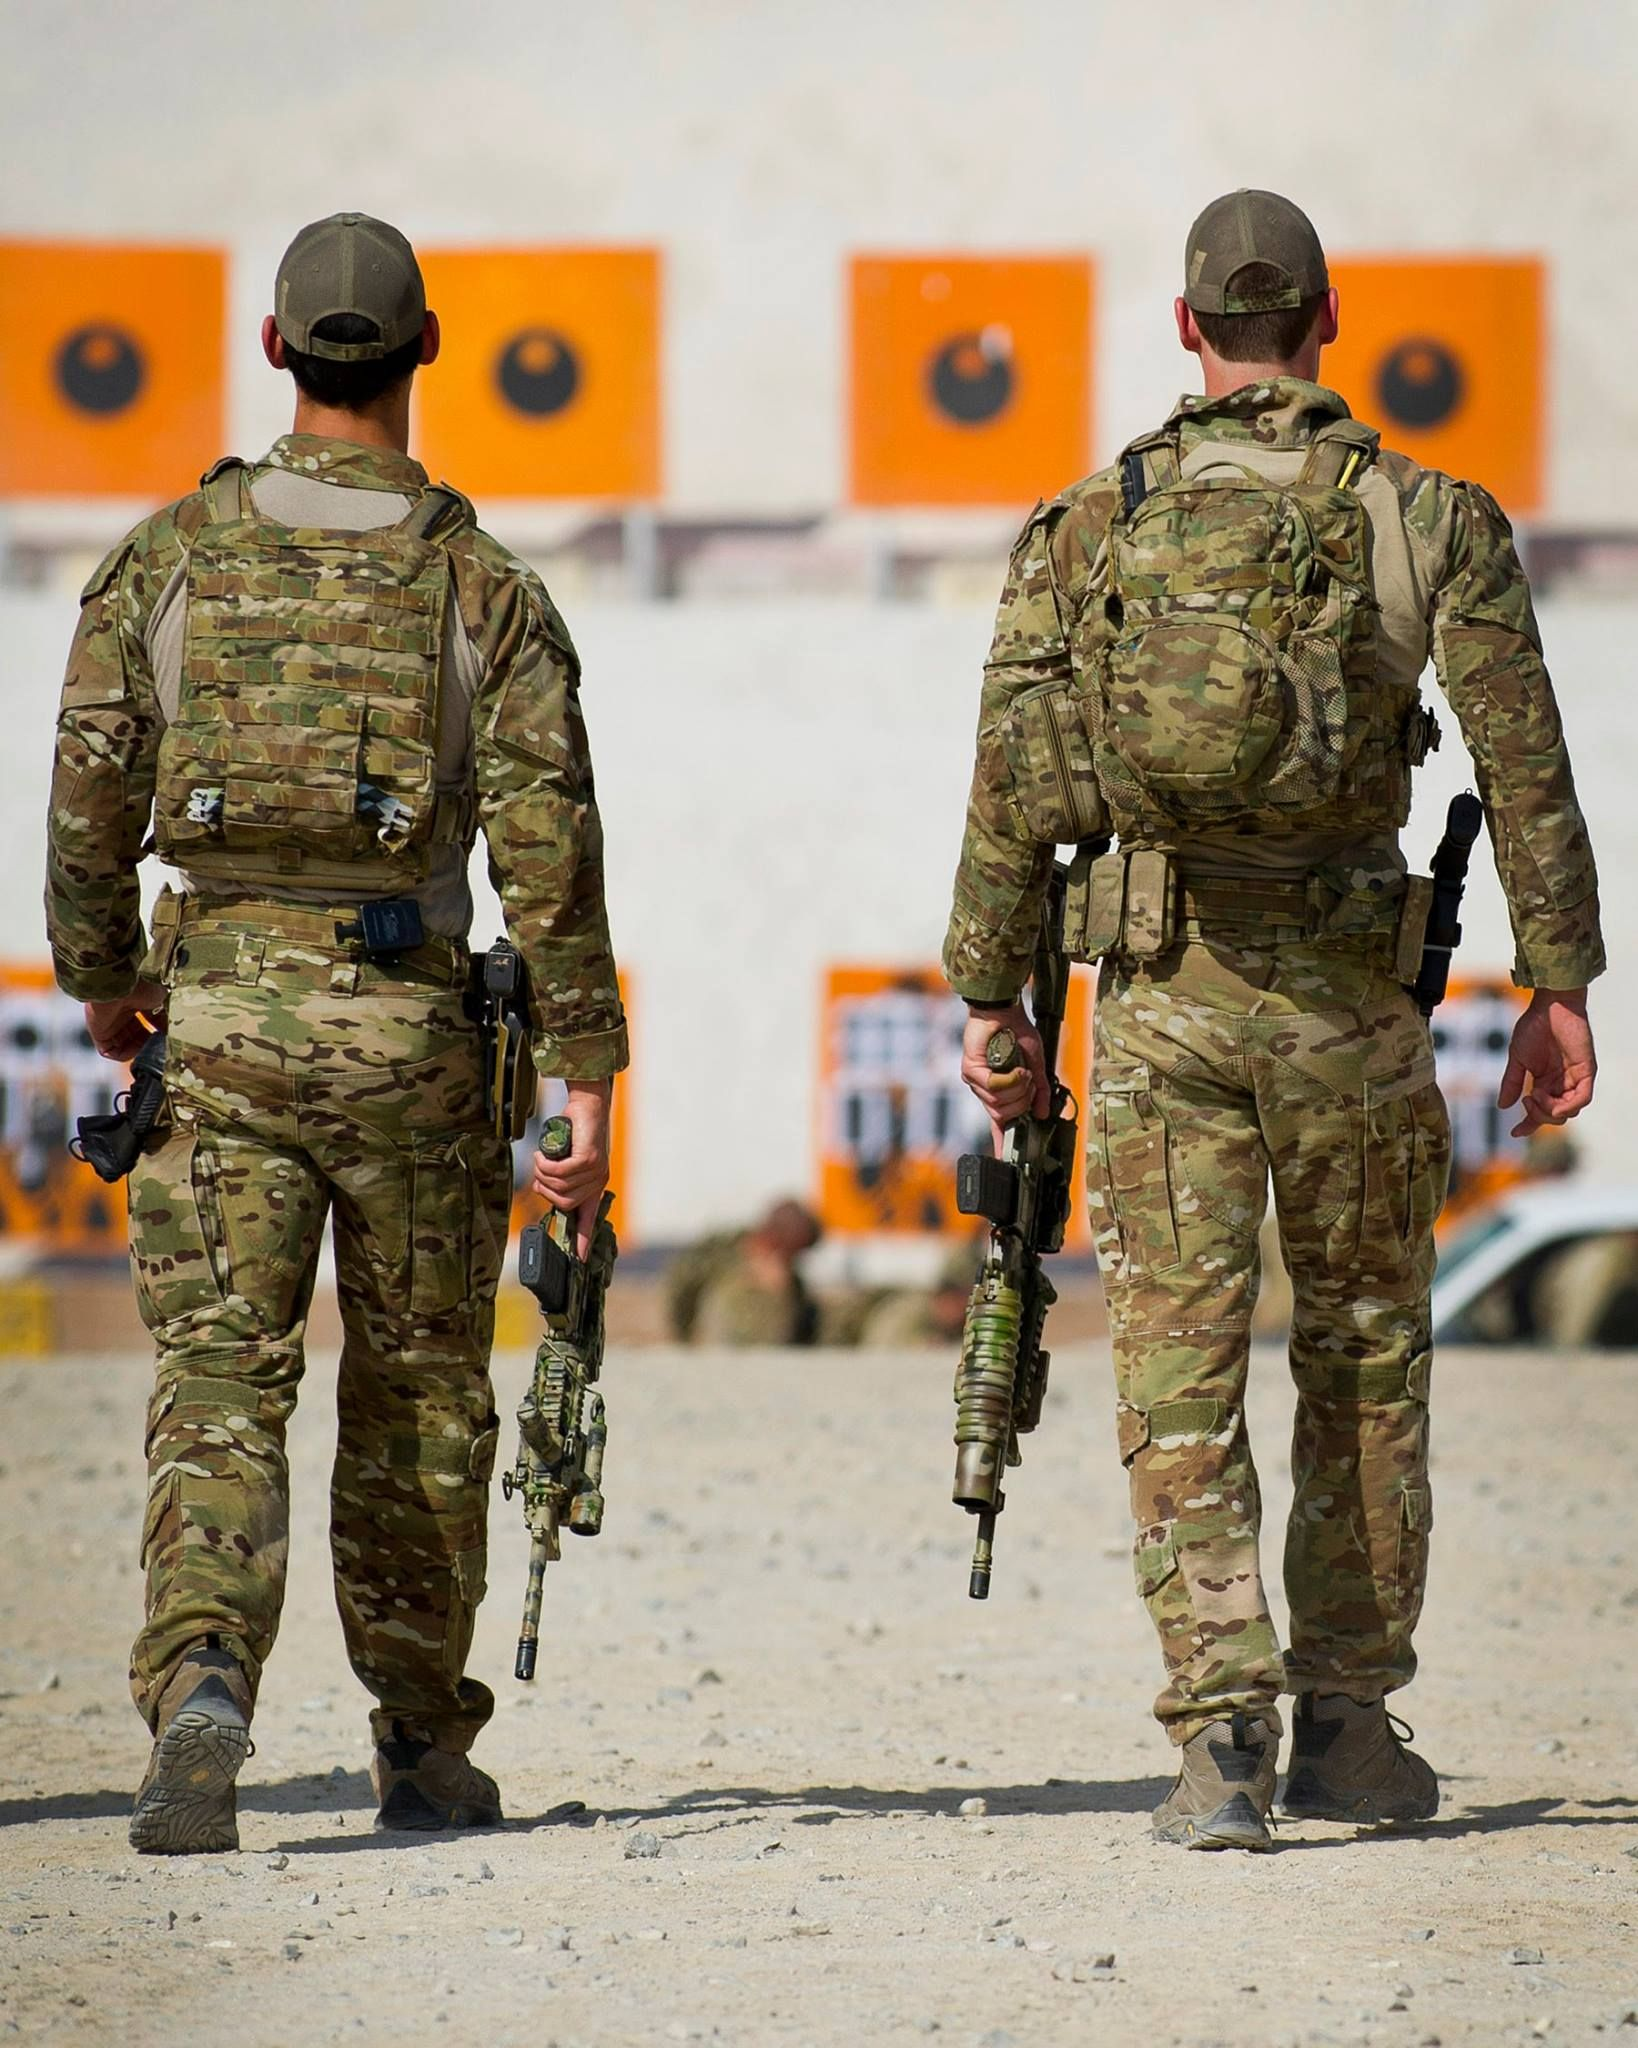 Australian 2nd Commando Regiment on the range. (1638x2048